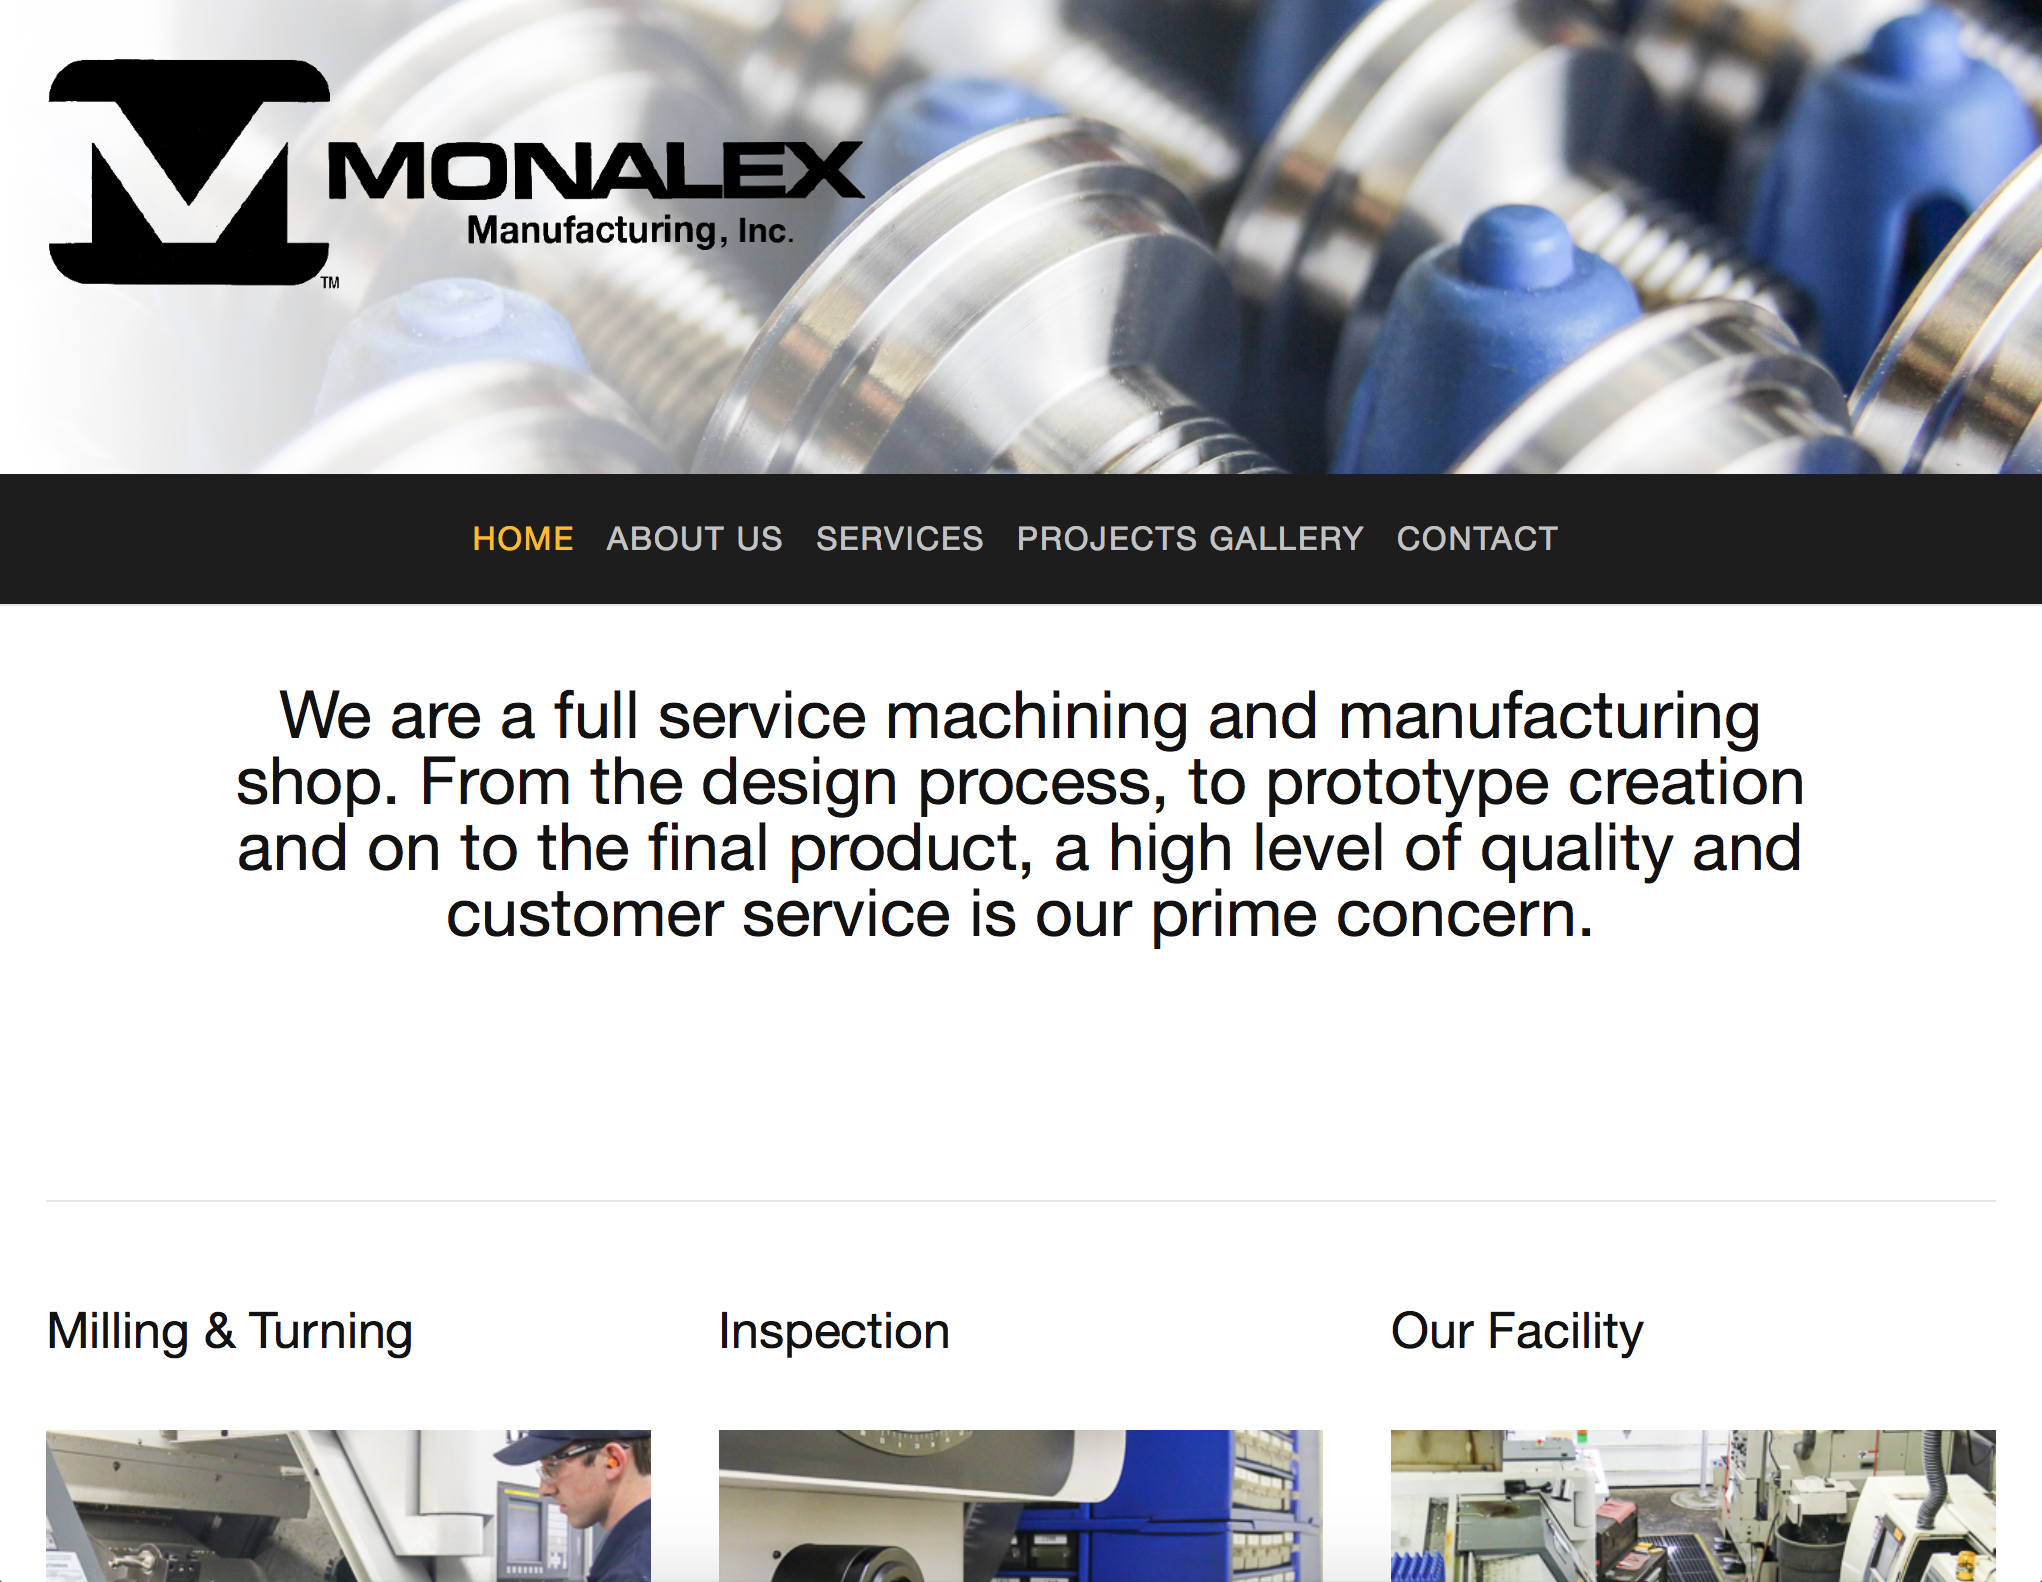 Monalex Mfg.